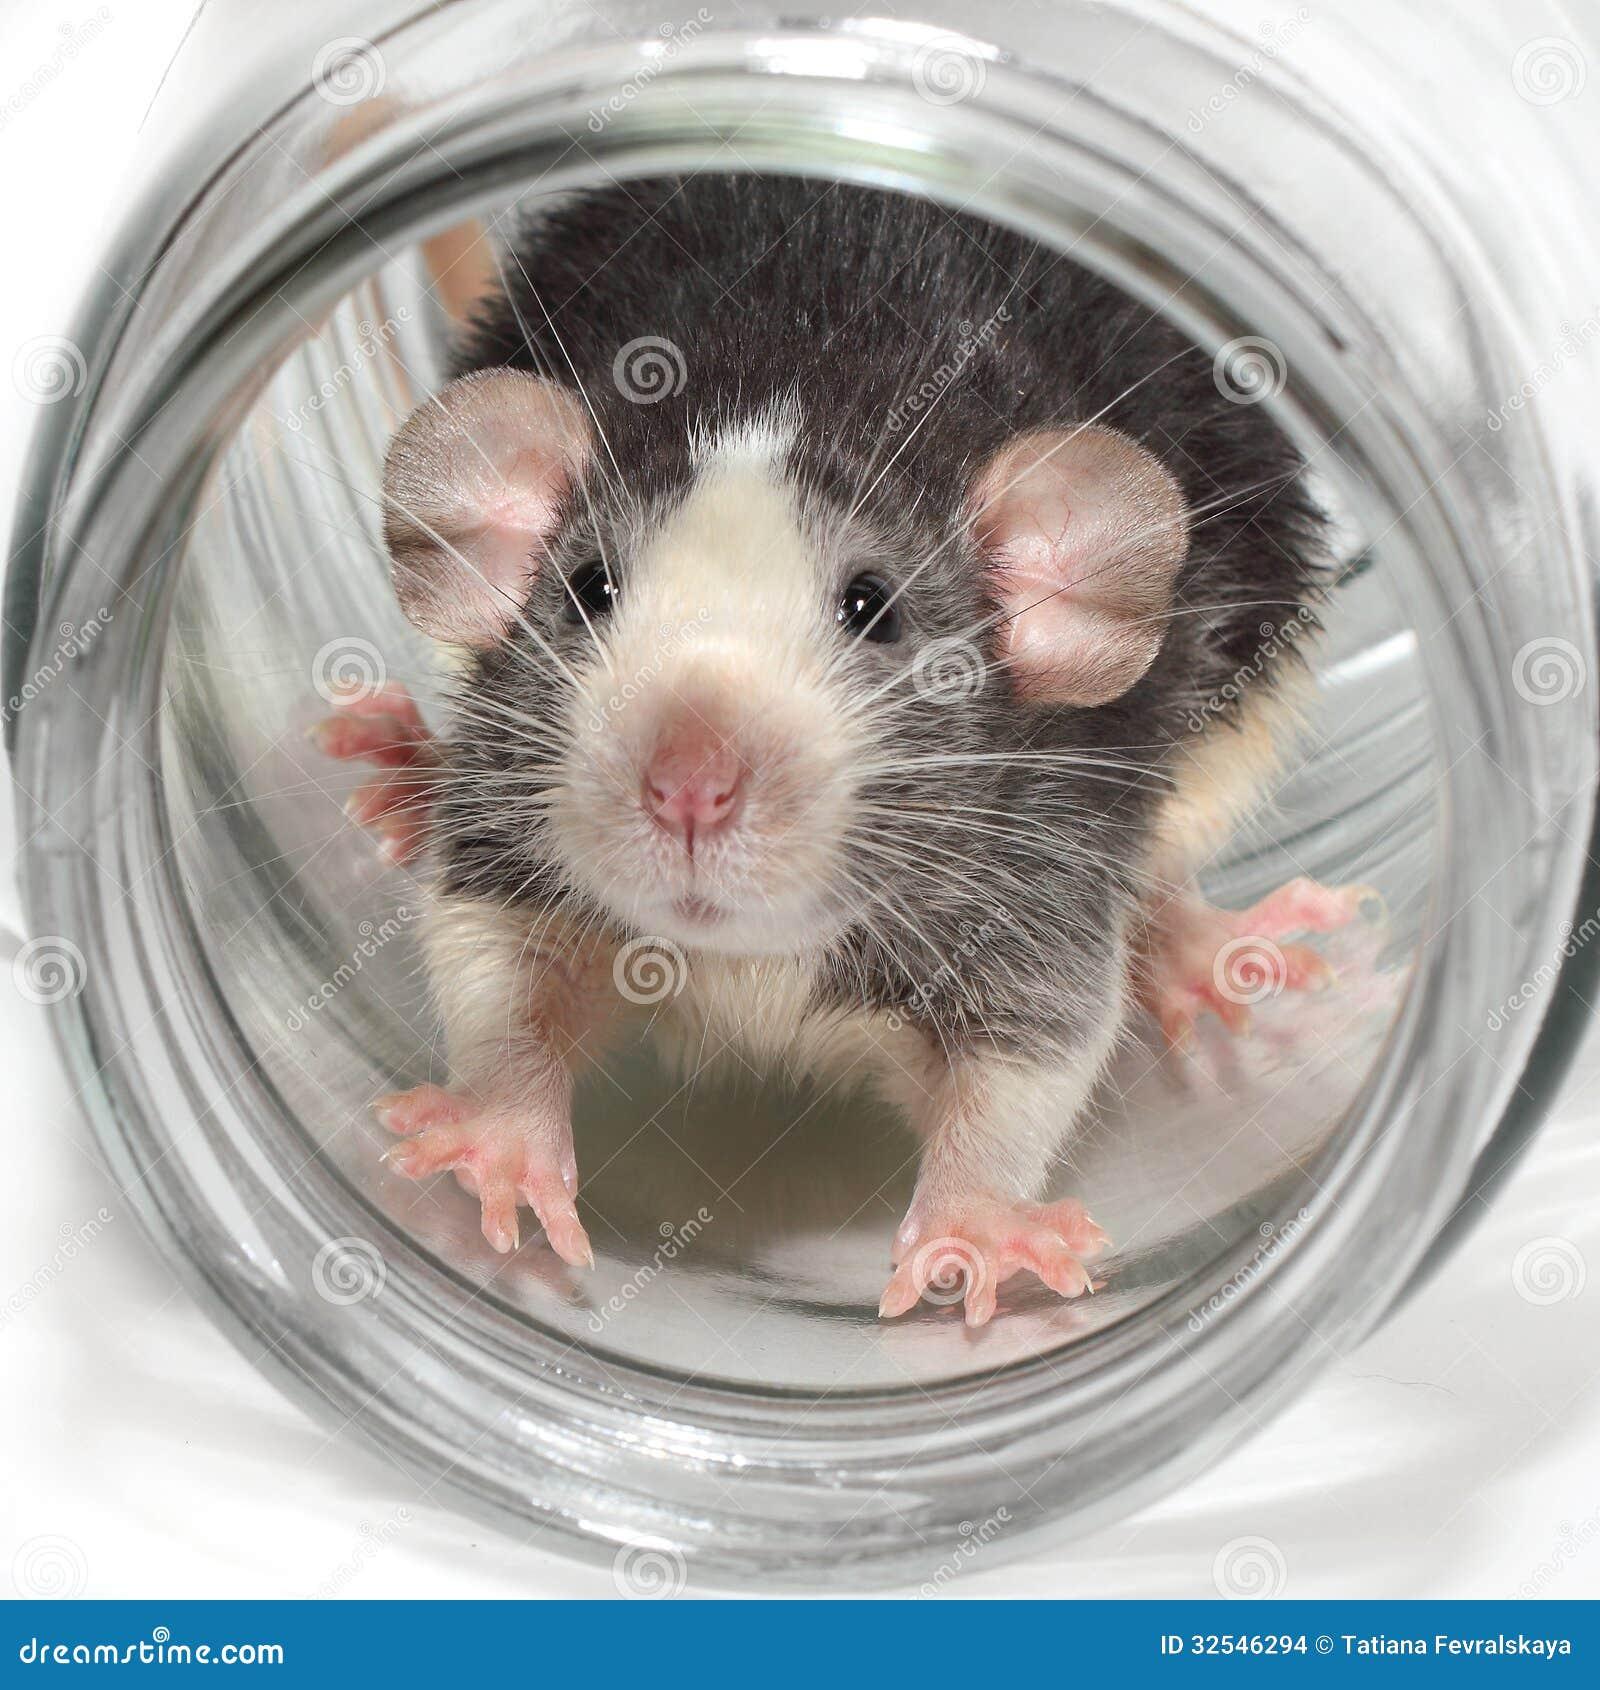 Cute dumbo rat